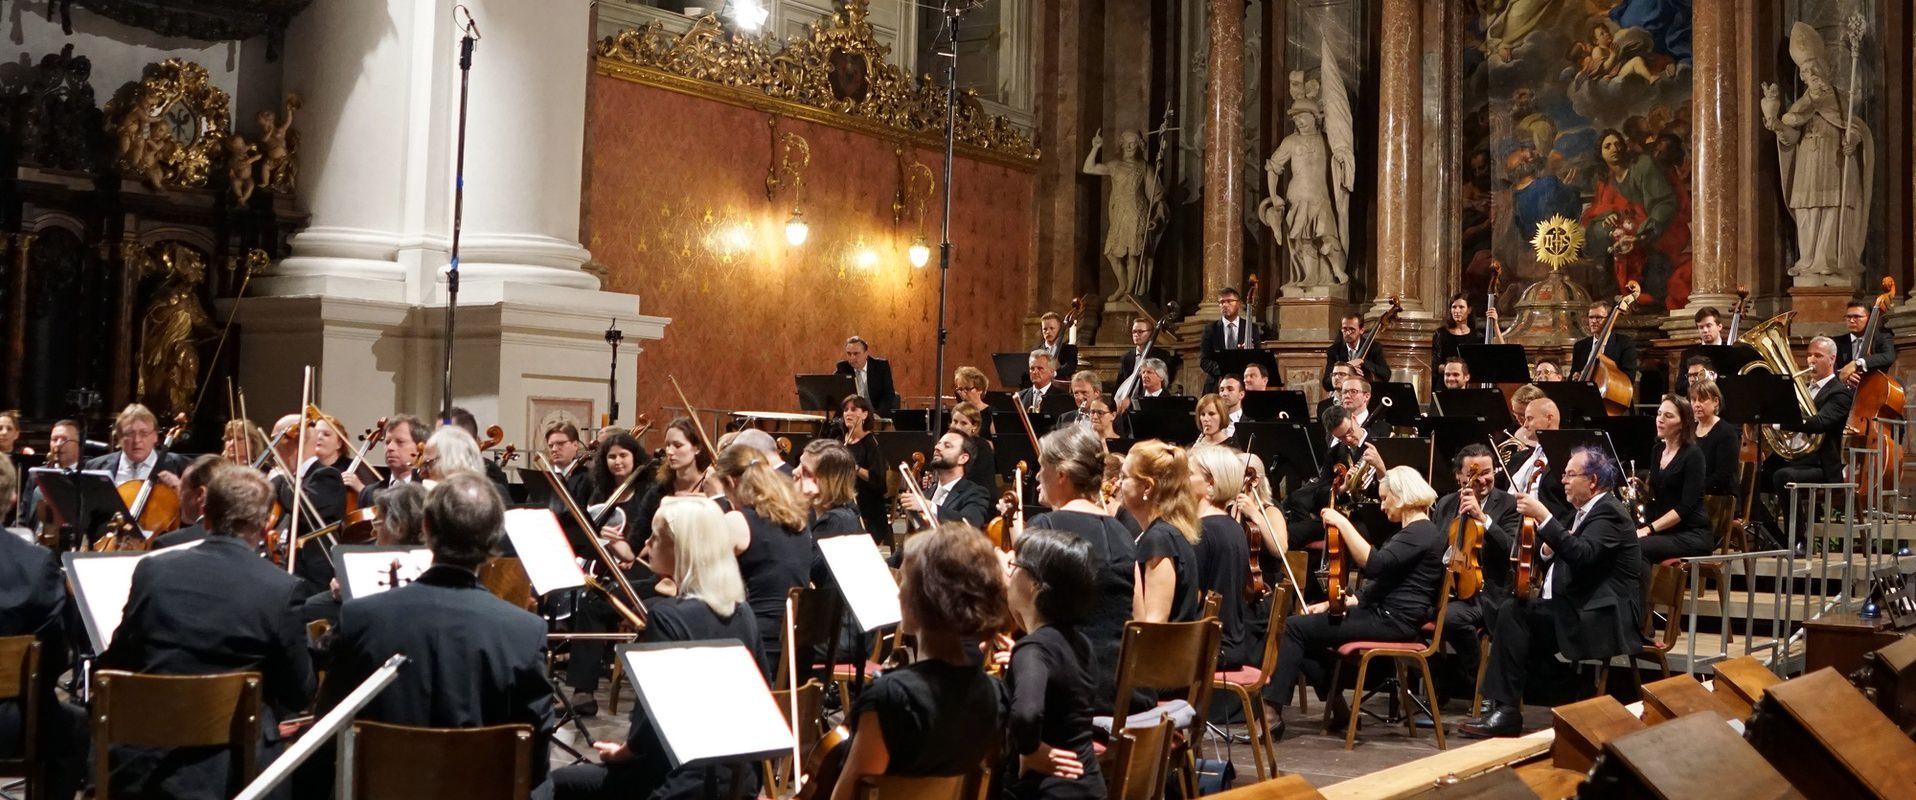 SYMPHONIEKONZERT Altomonte Orchester Rémy Ballot 3D 360 video